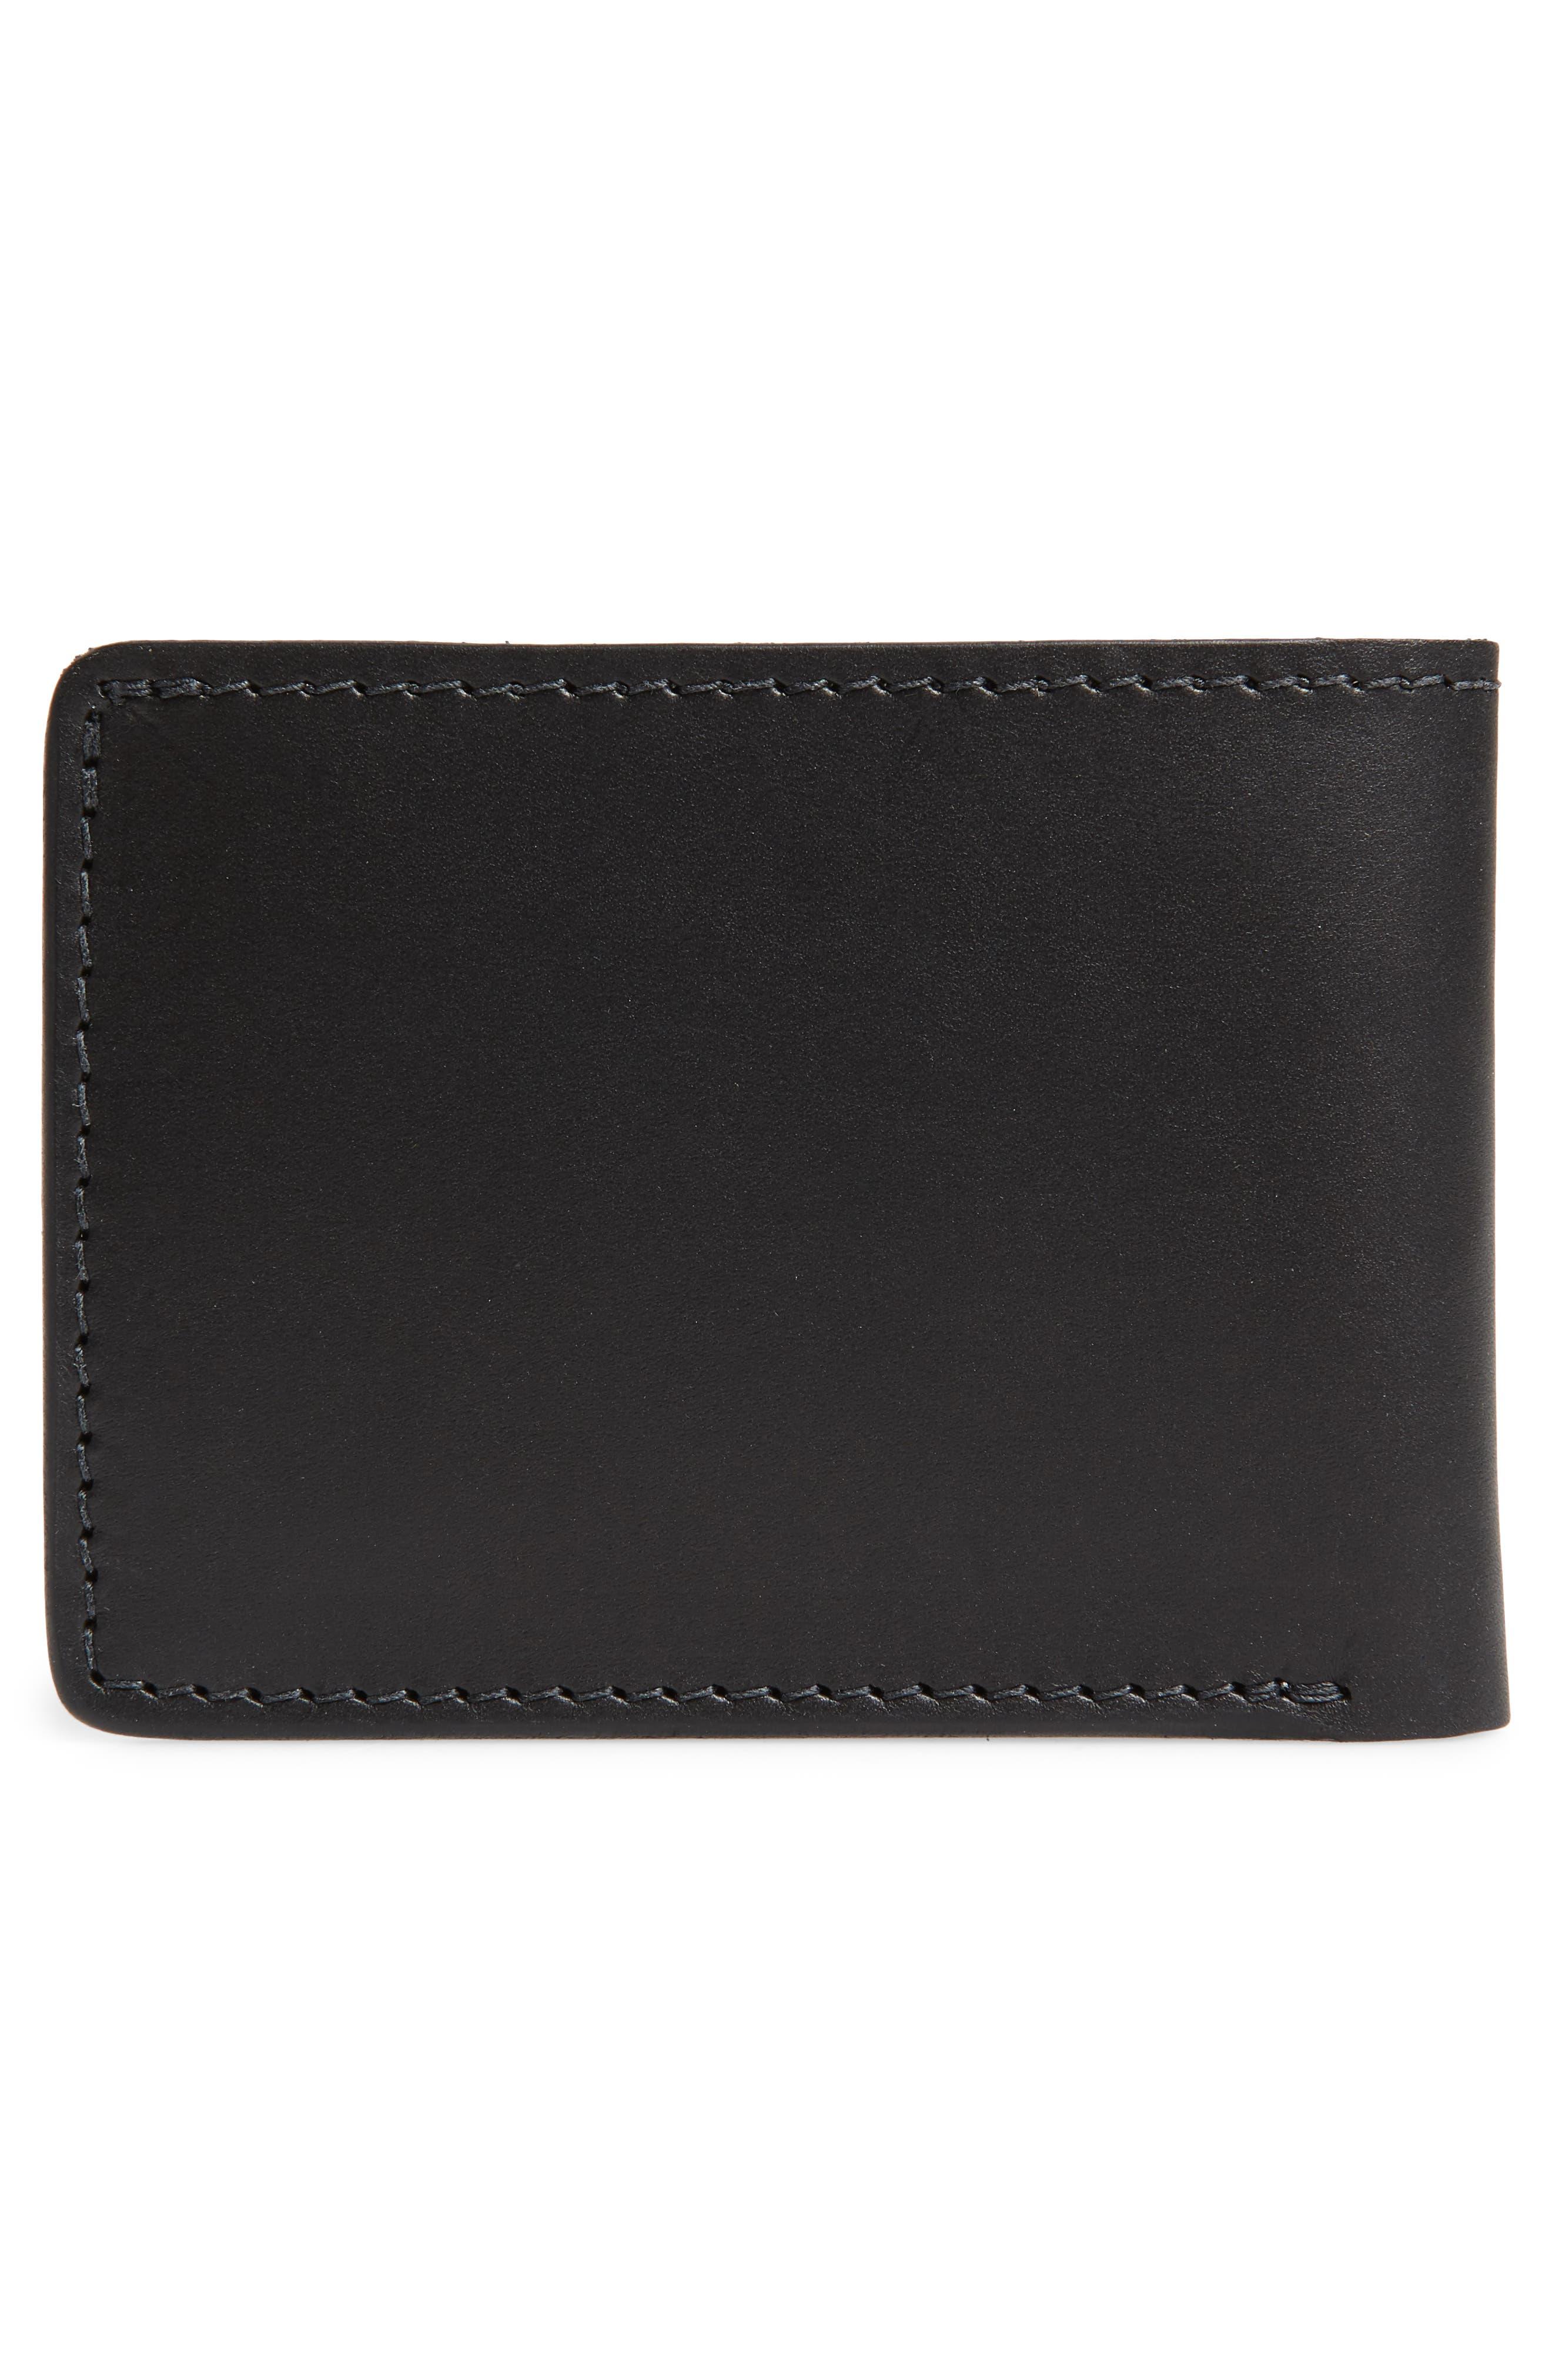 Utility Leather Bifold Wallet,                             Alternate thumbnail 2, color,                             Black